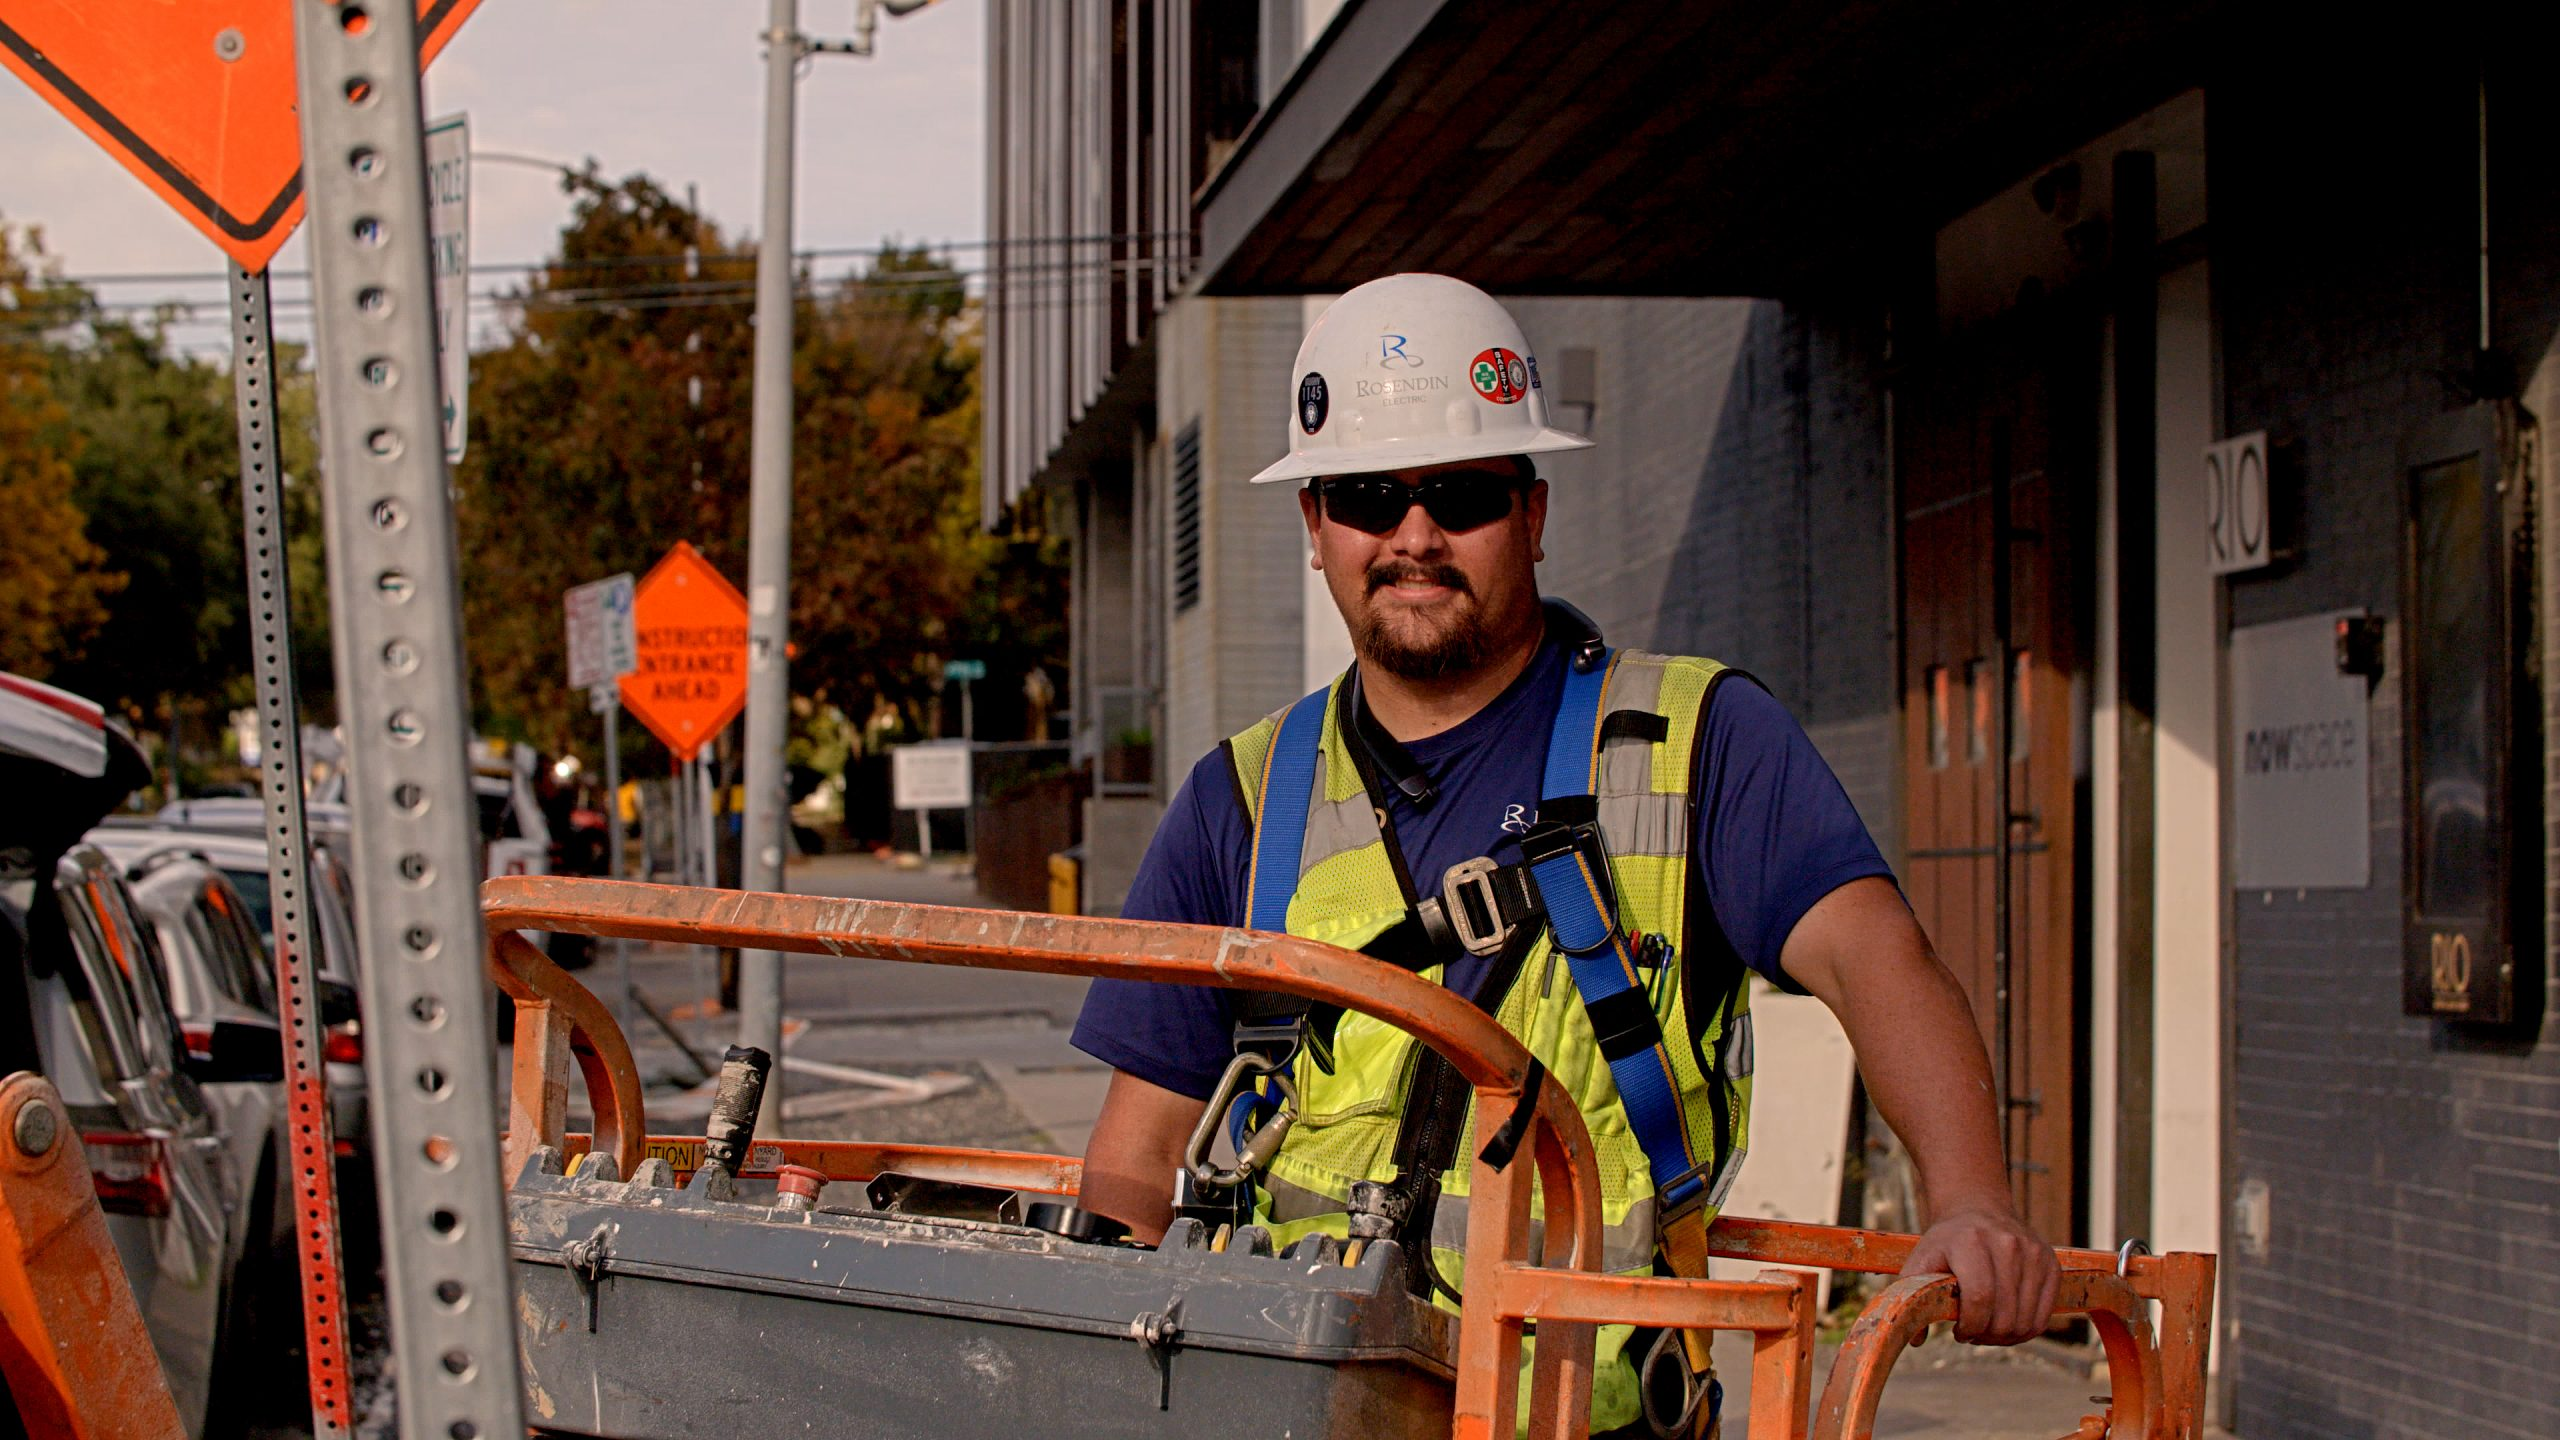 IBEW Local 520 - Electrical Worker - Jobsite